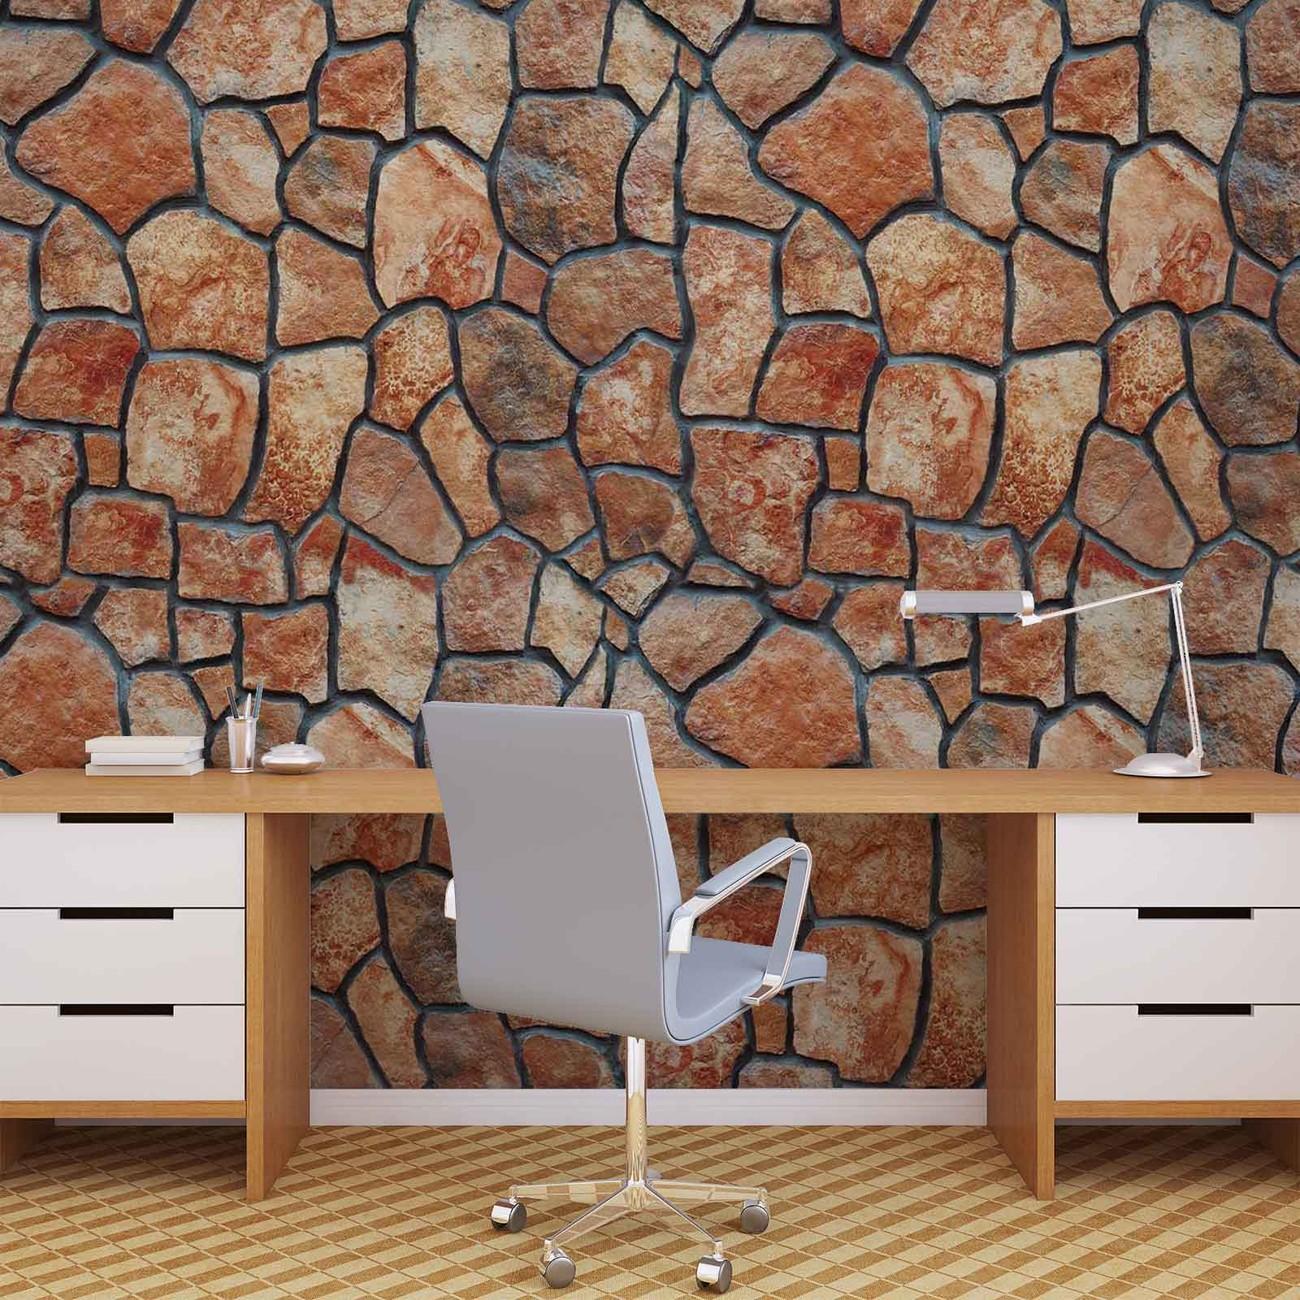 Fotomurale pared de piedra papel pintado for Fotomurales pared